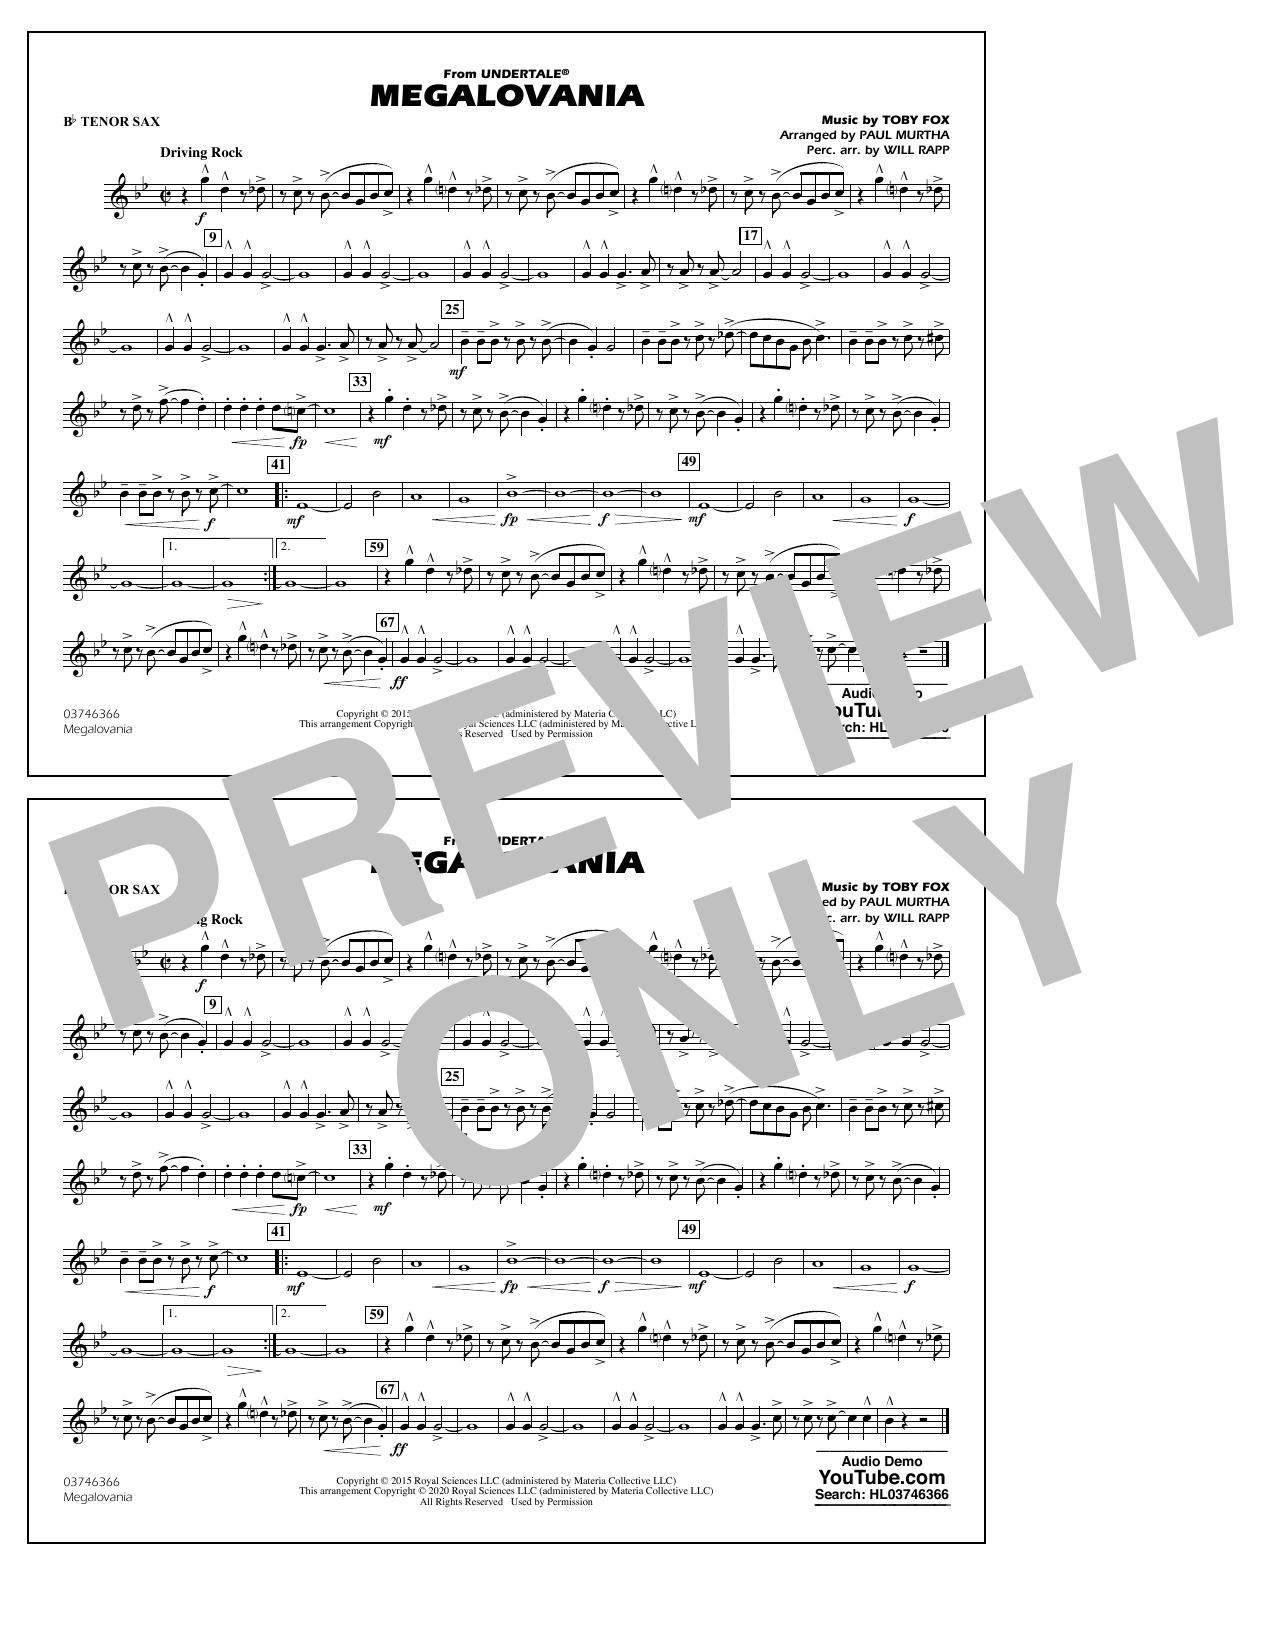 Megalovania (from Undertale) (arr. Paul Murtha) - Bb Tenor Sax Sheet Music